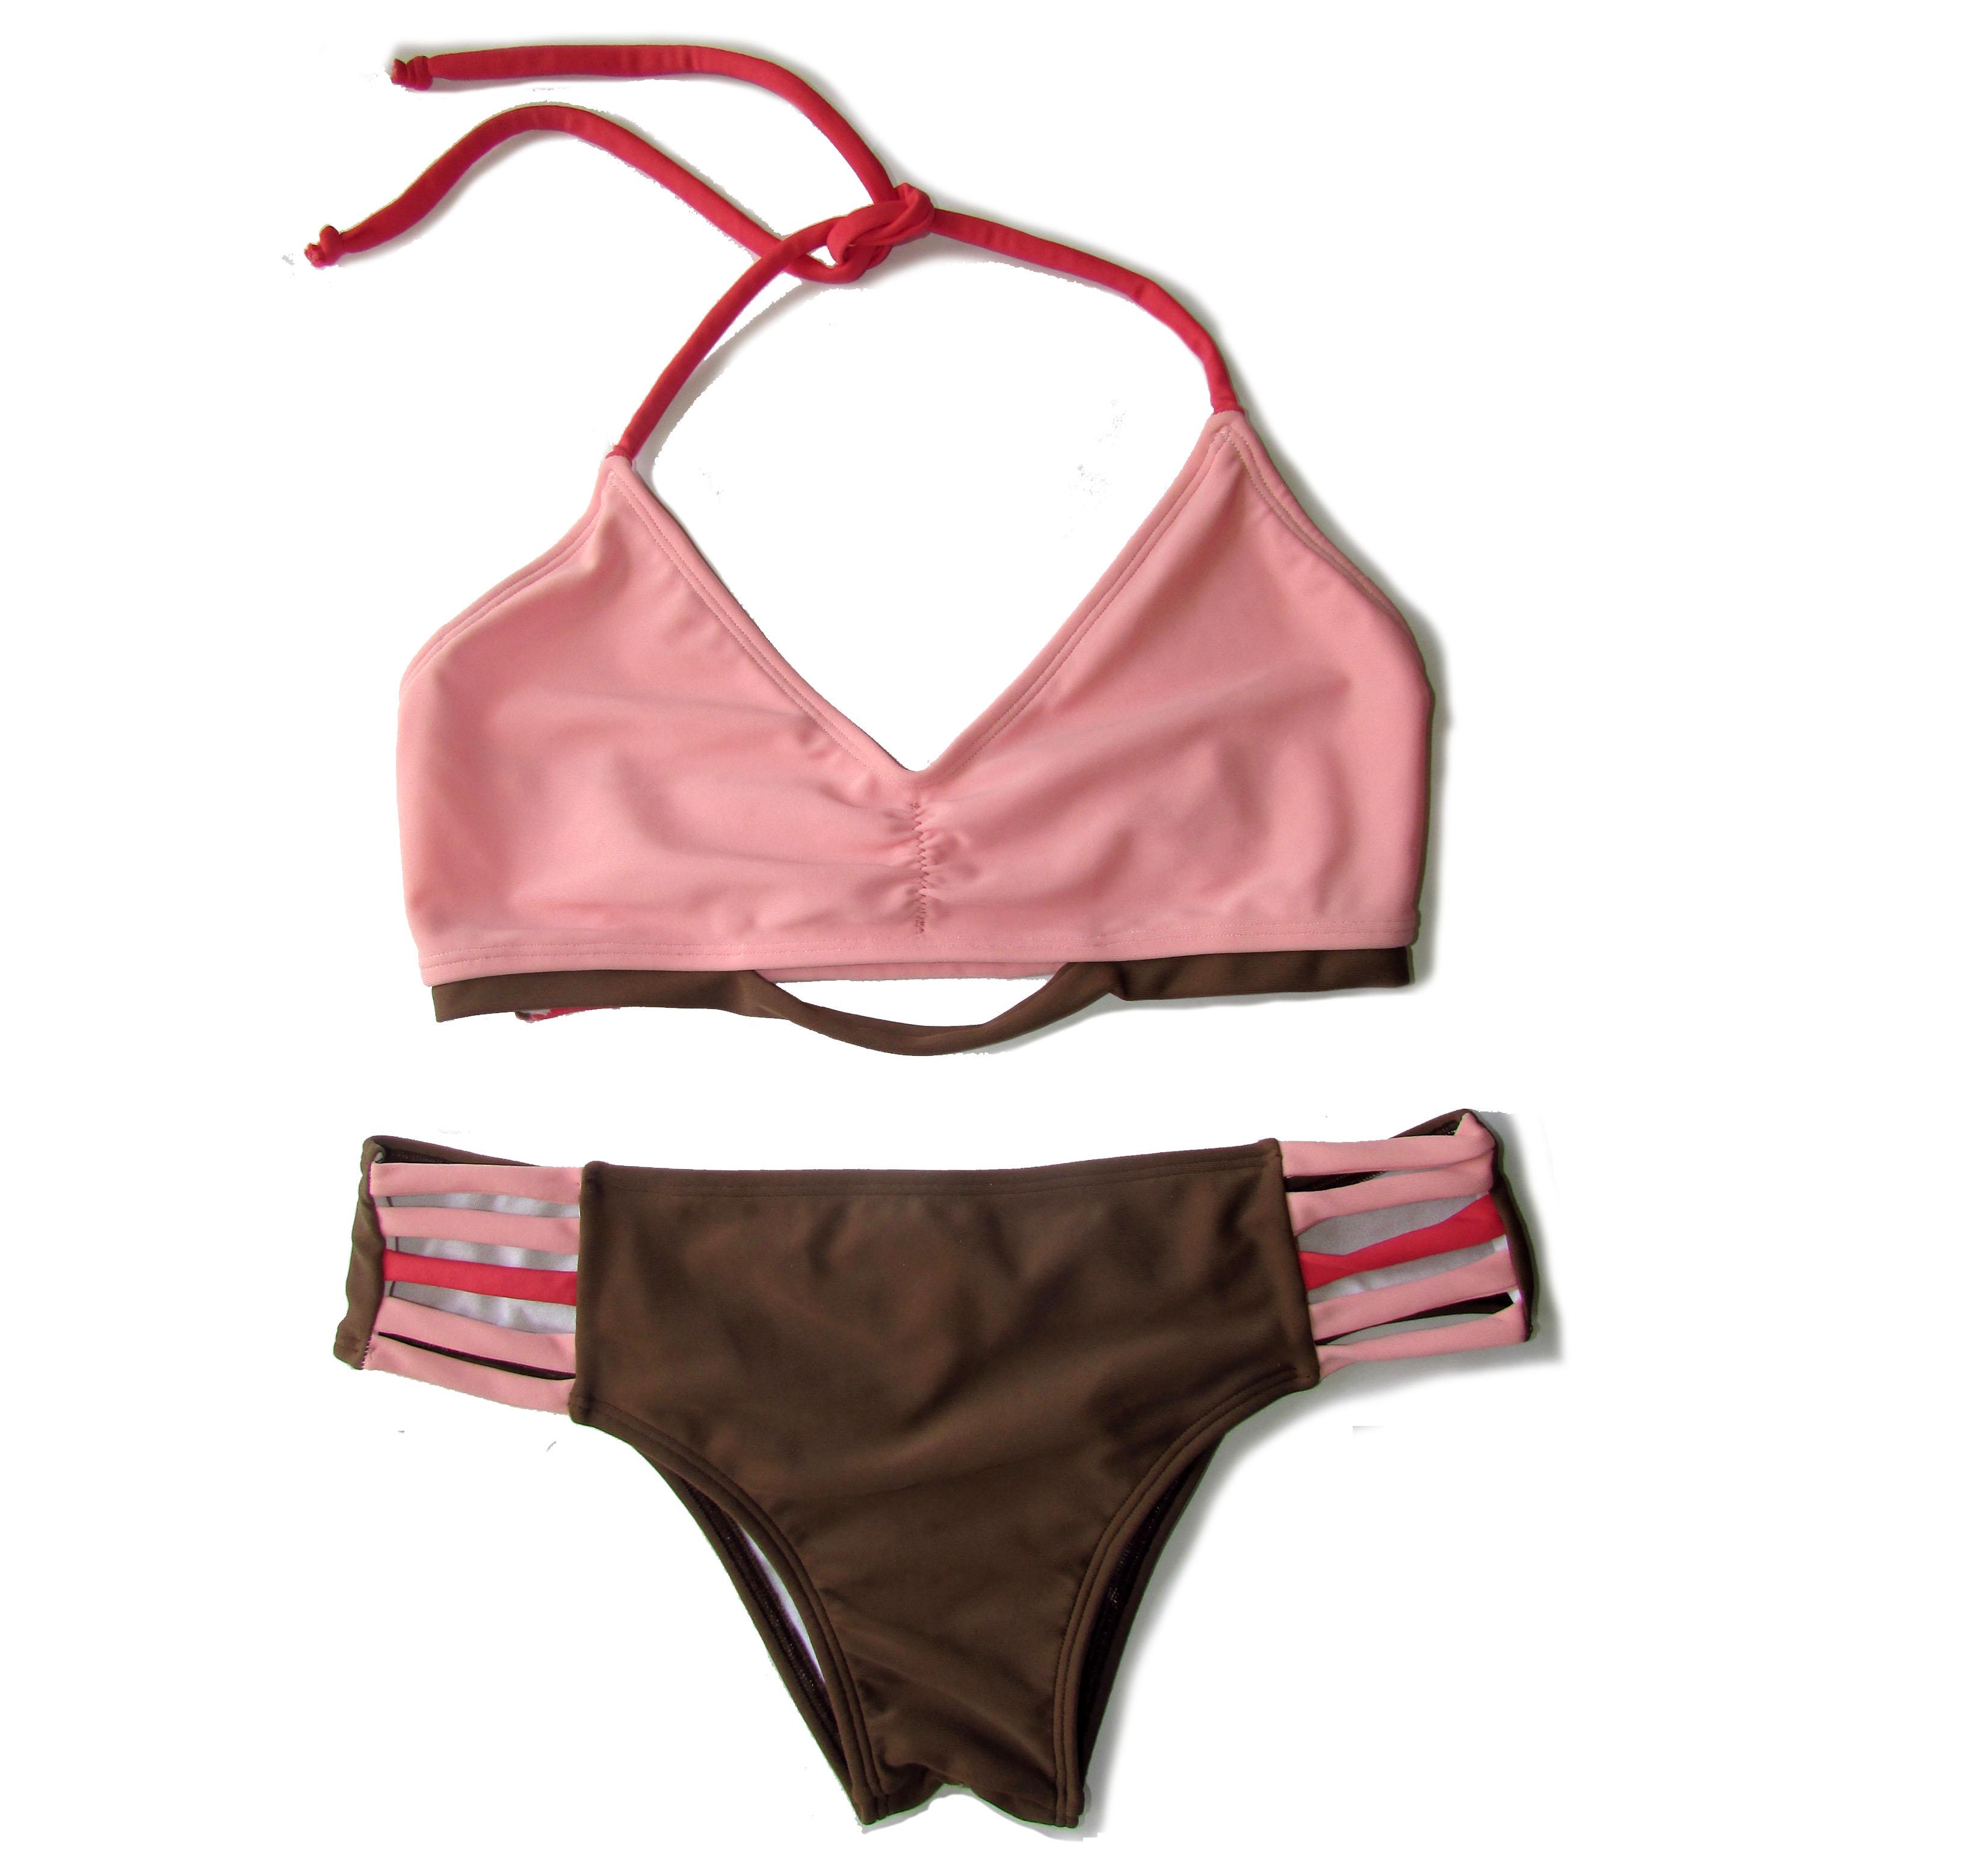 fba0c8d69a Joryang Swimwear bikini set on Storenvy